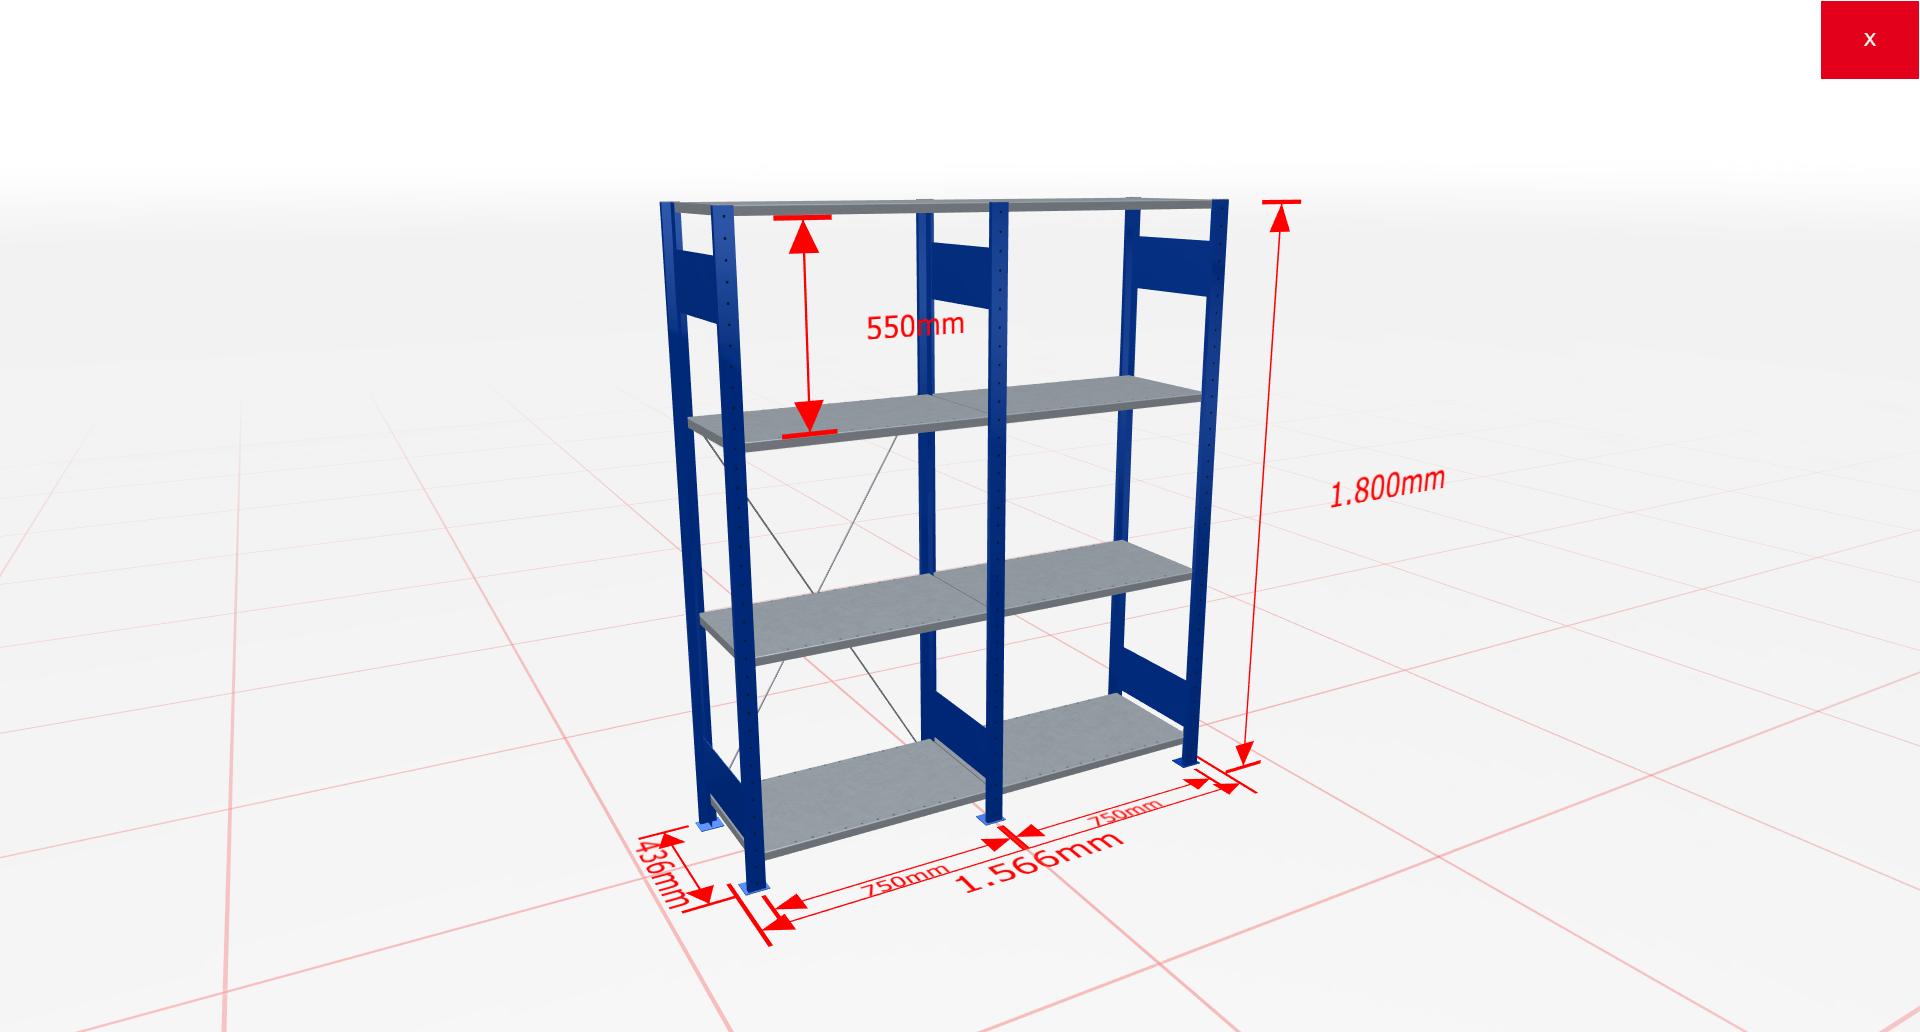 Fachbodenregal Komplettregal 1800x1566x400 mm (HxBxT) SCHULTE Lagertechnik blau 4 Ebenen  150 kg je Boden